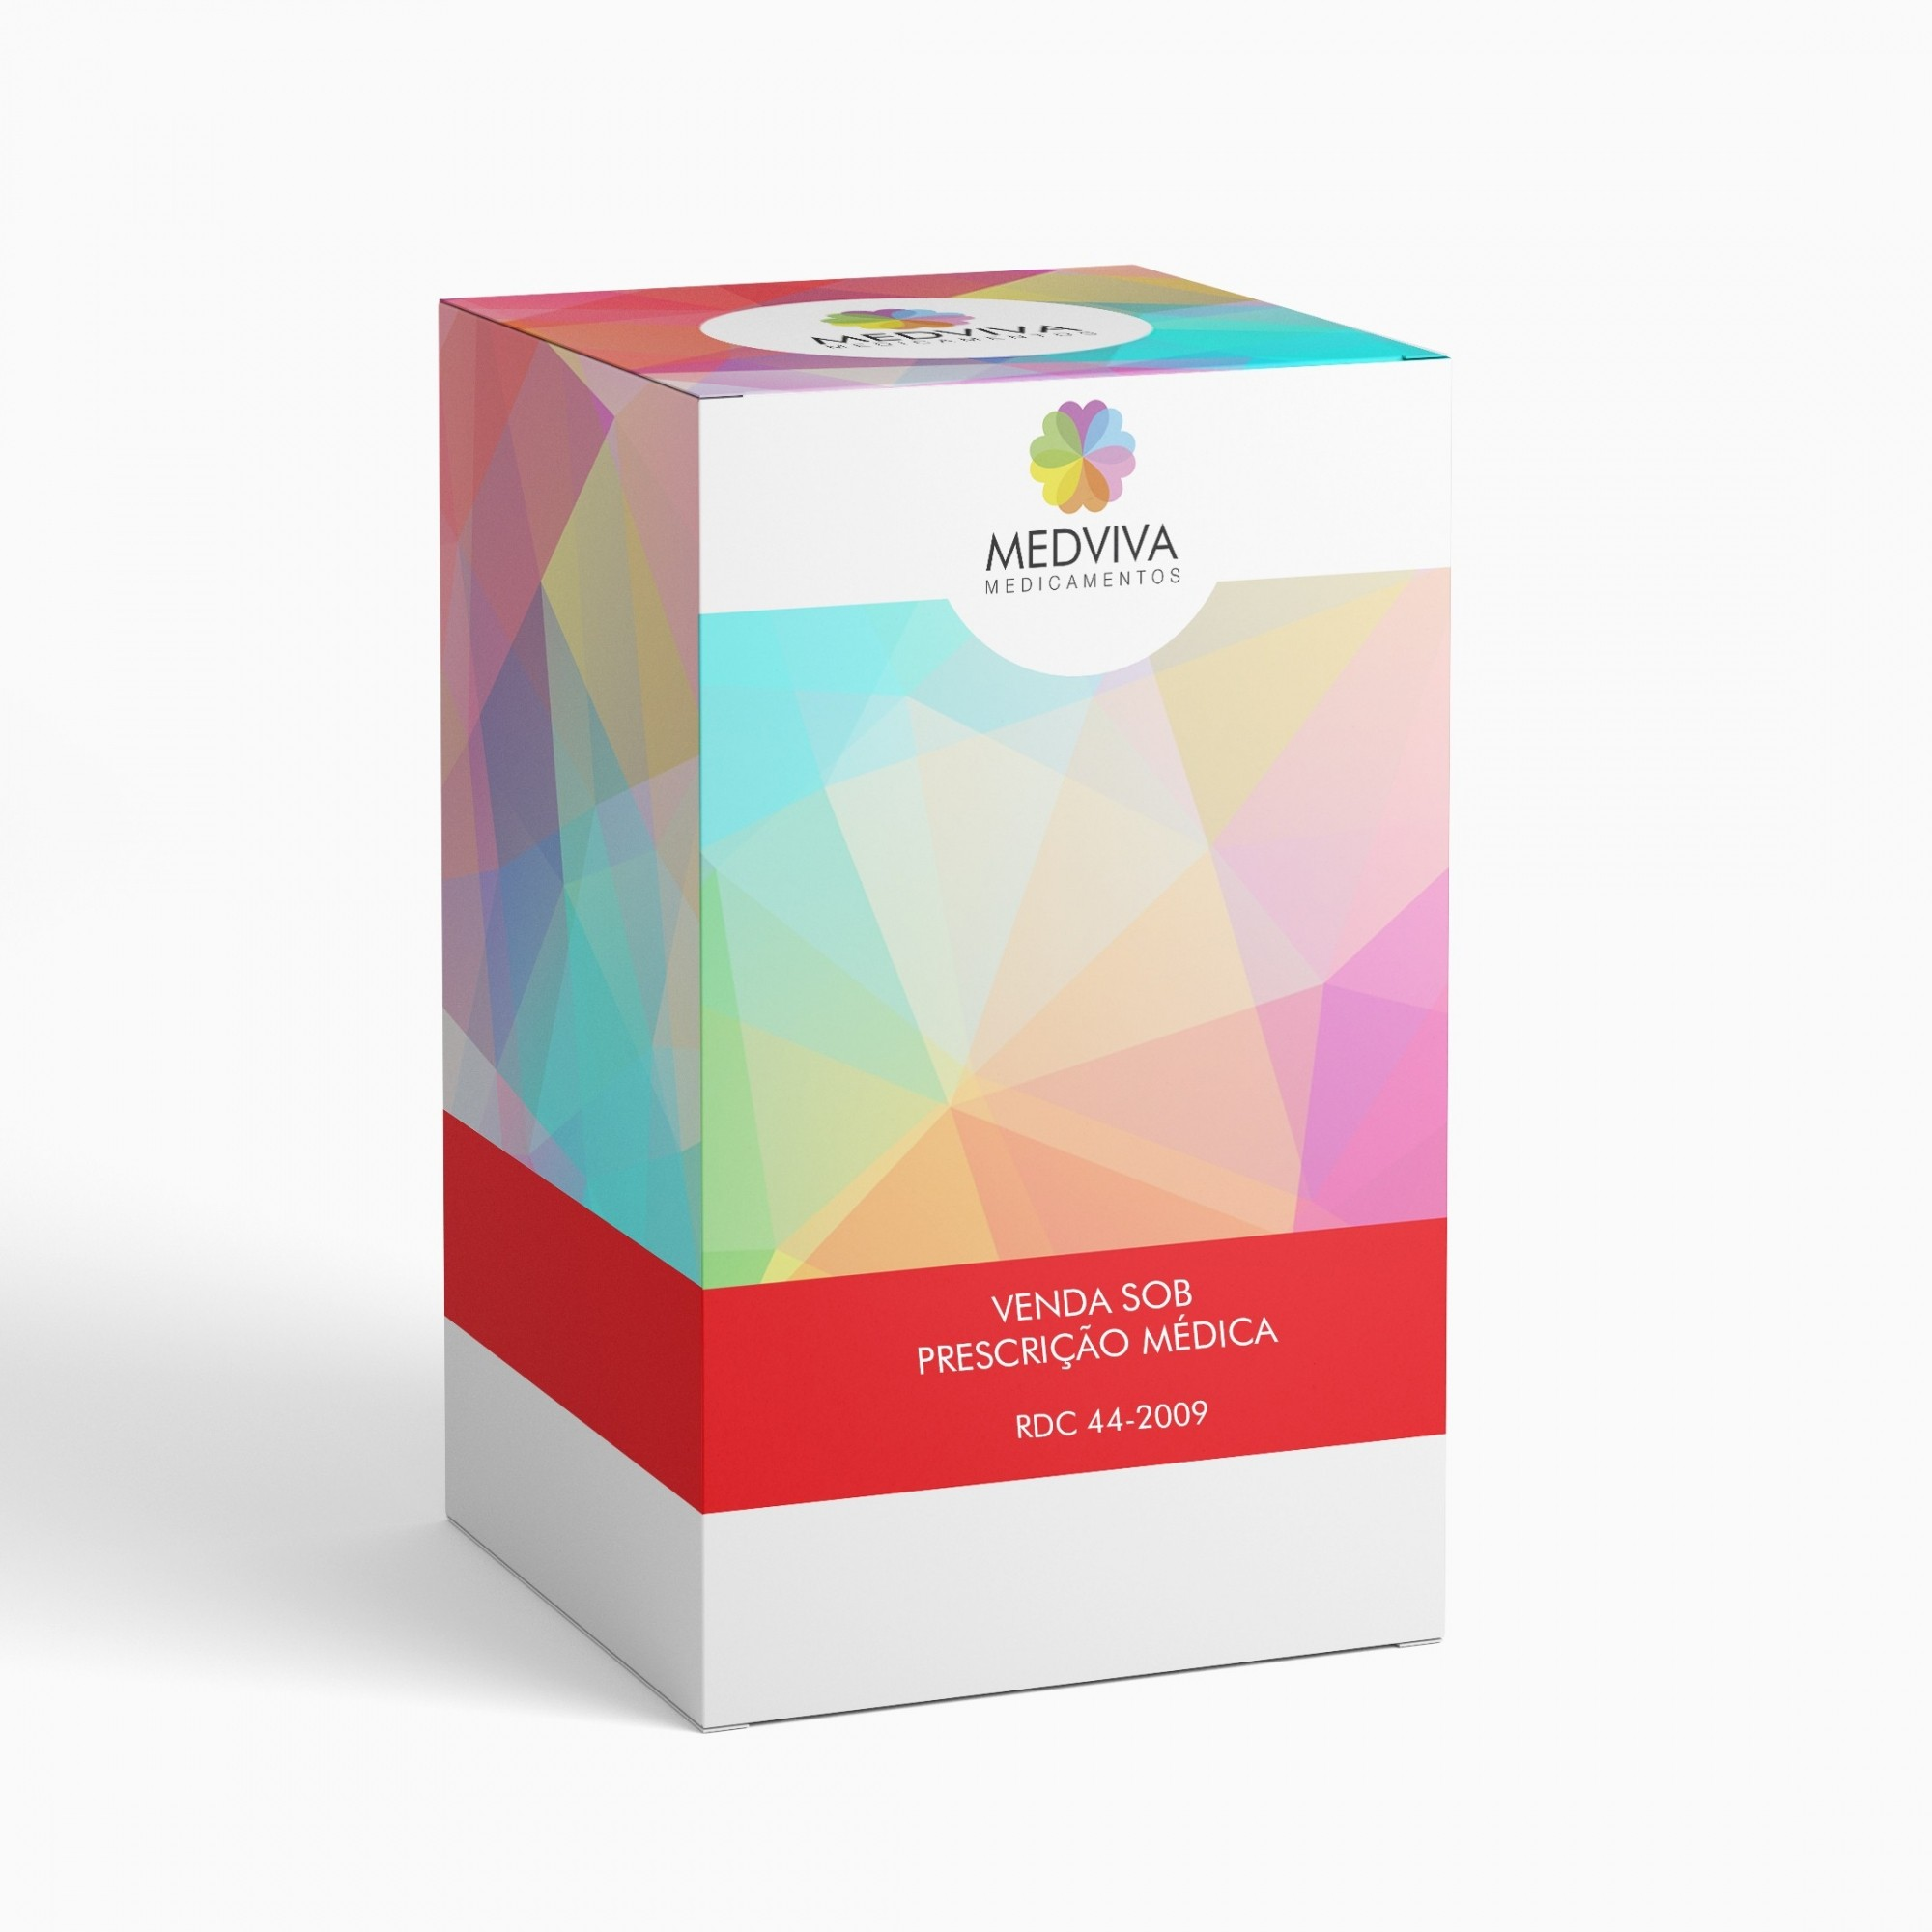 Cloridrato De Metformina 500 mg 30 Comprimidos Merck